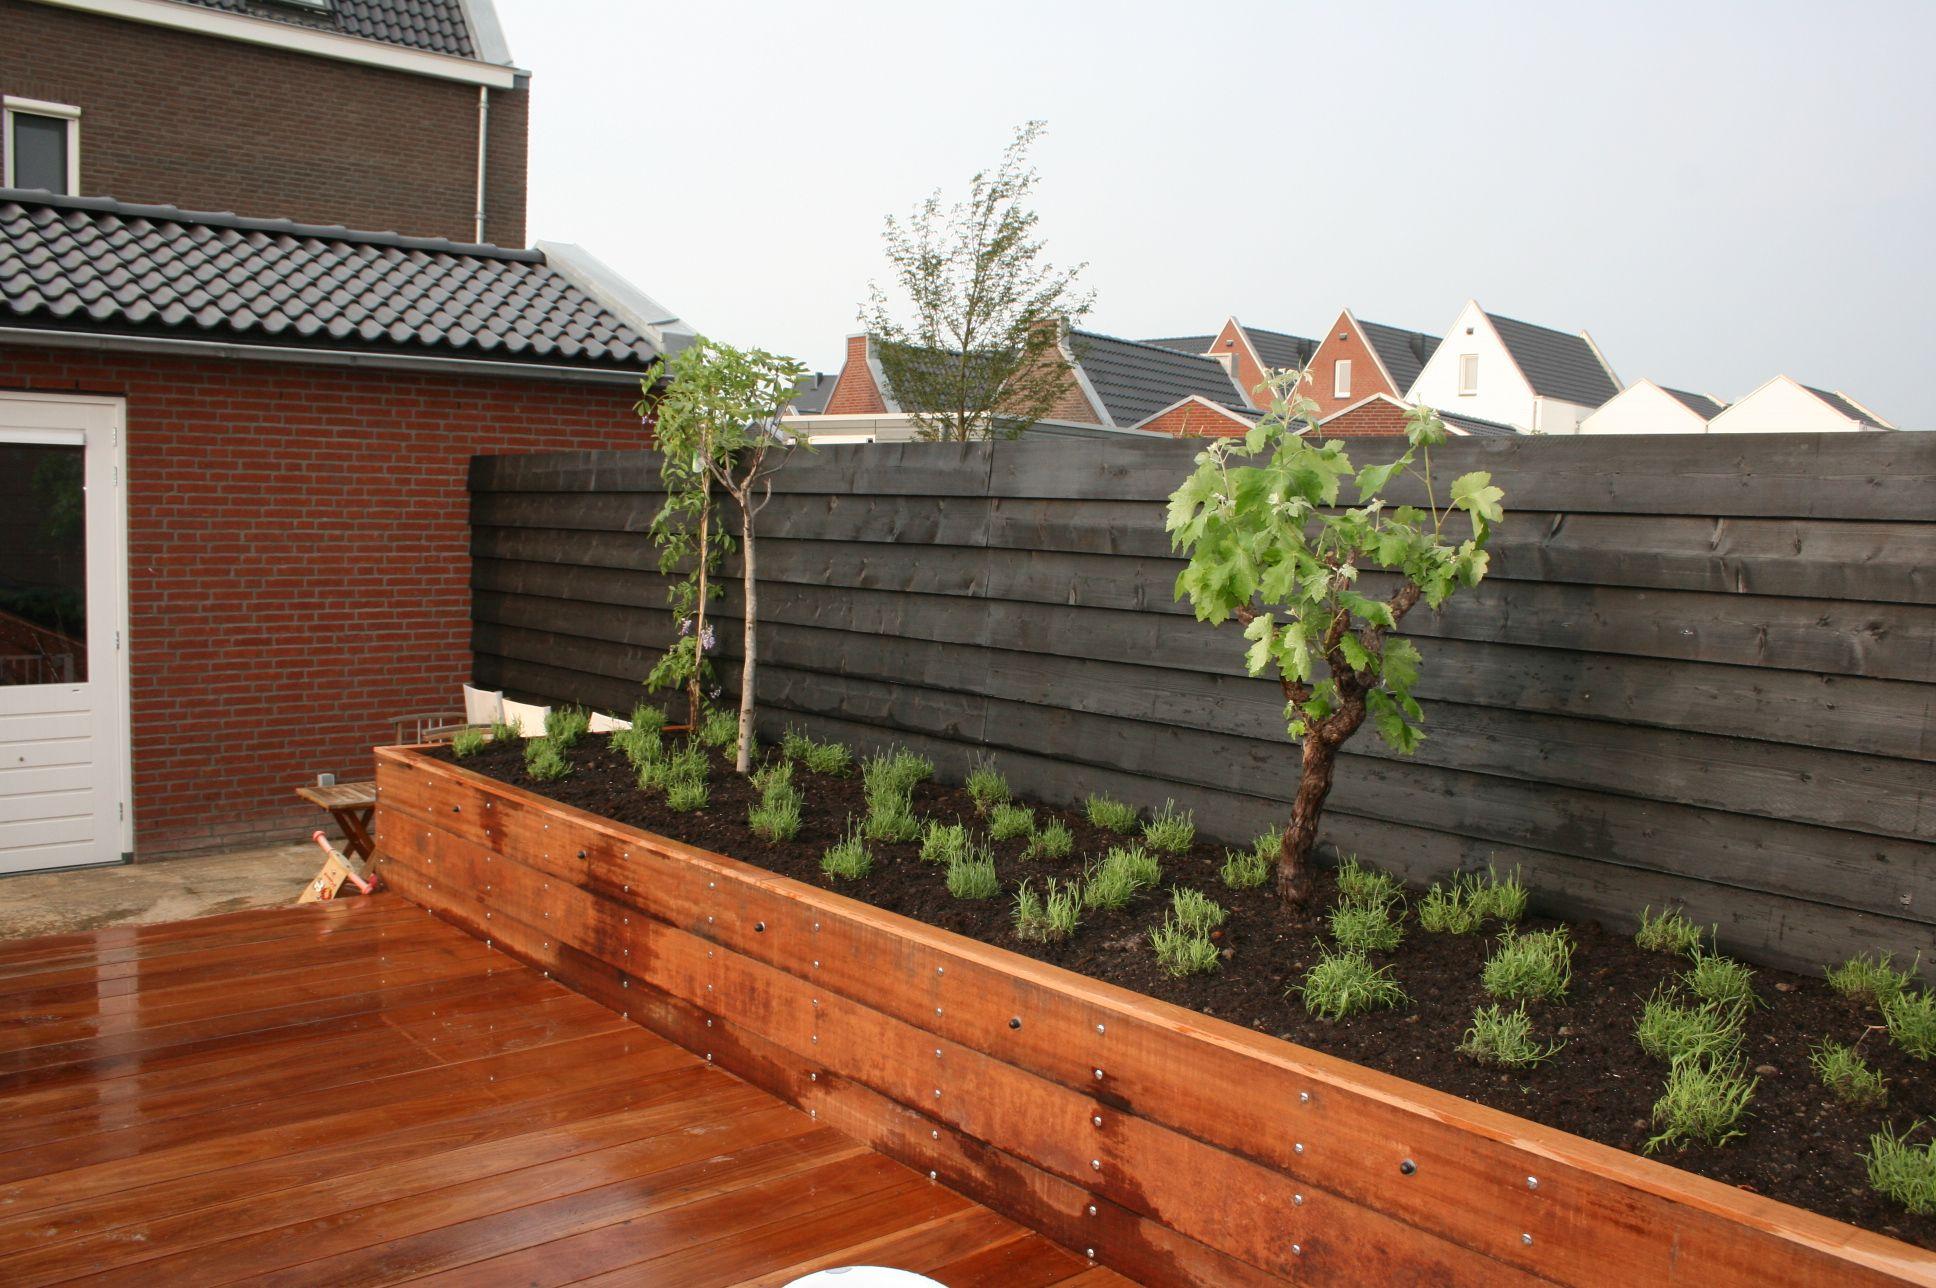 Schutting zwarte planken potdekselen tuin pinterest schutting planken en tuin - Planken zwarte ...